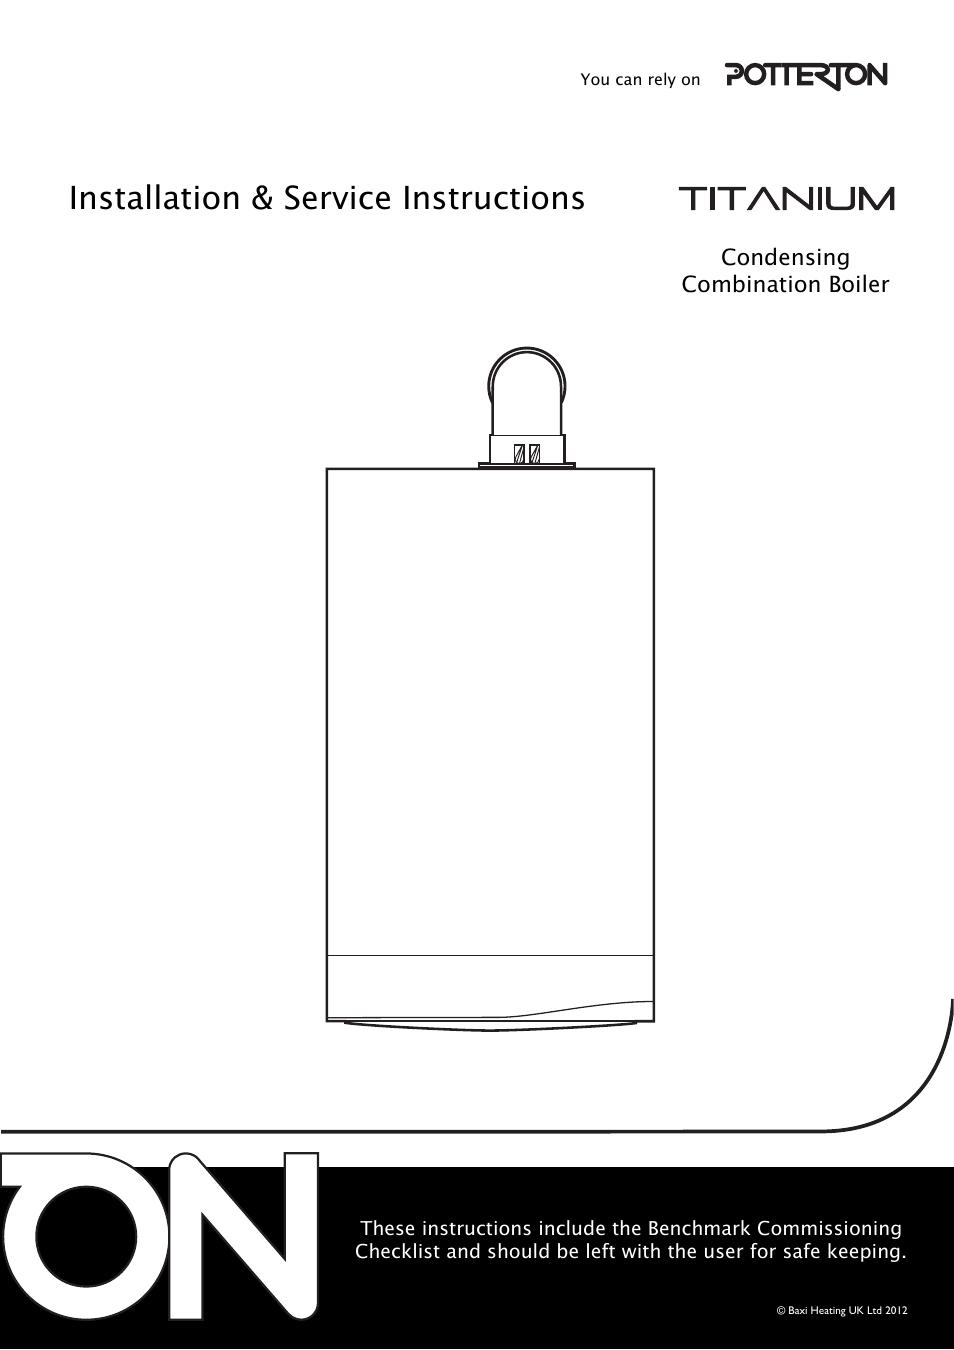 Hive And Potterton Titanium Manual Guide